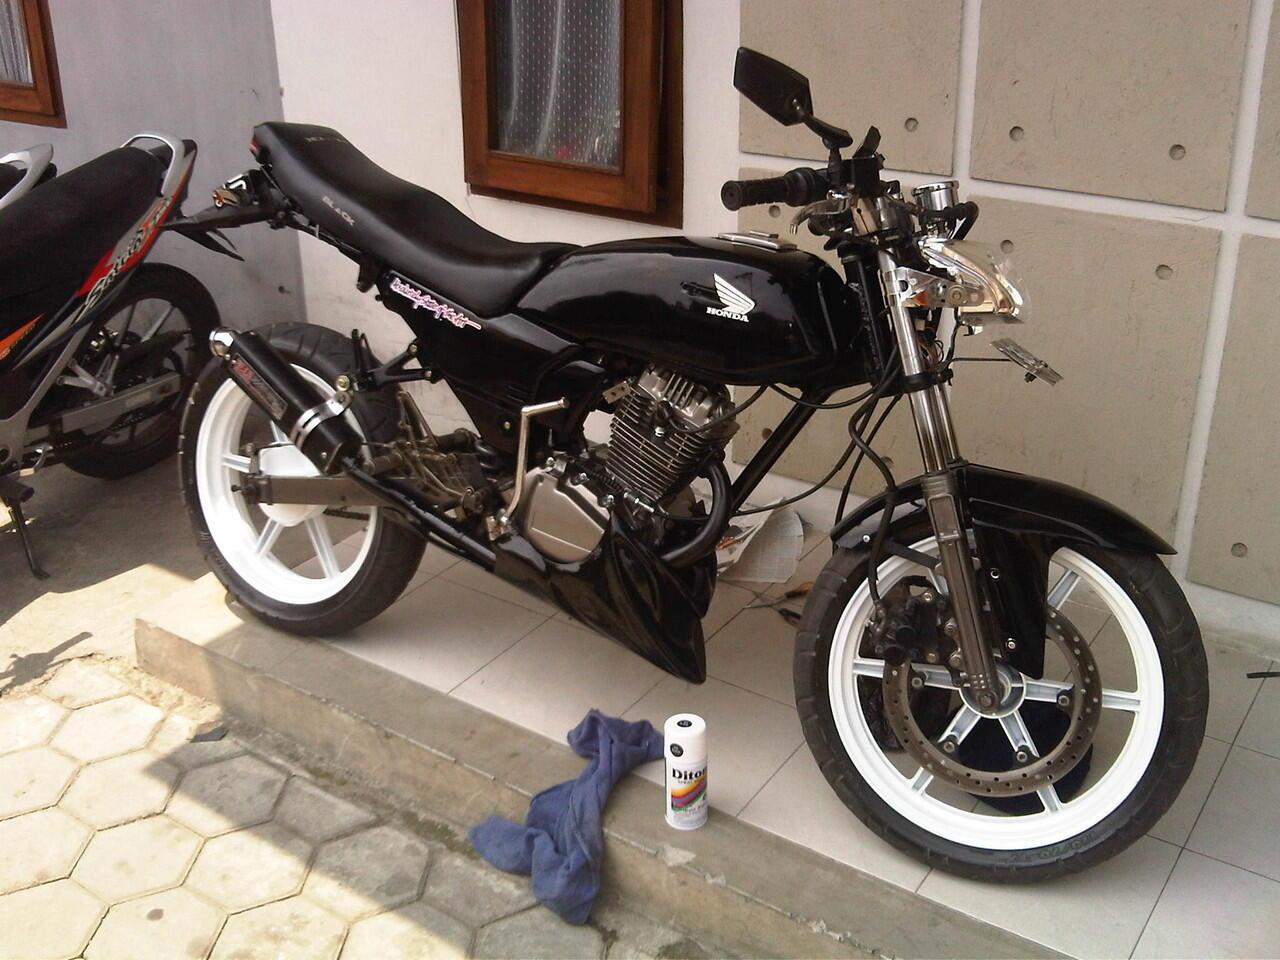 Jual Honda GL-PRO Tahun 1993 (Black) Modif - Bandung - Plat Z